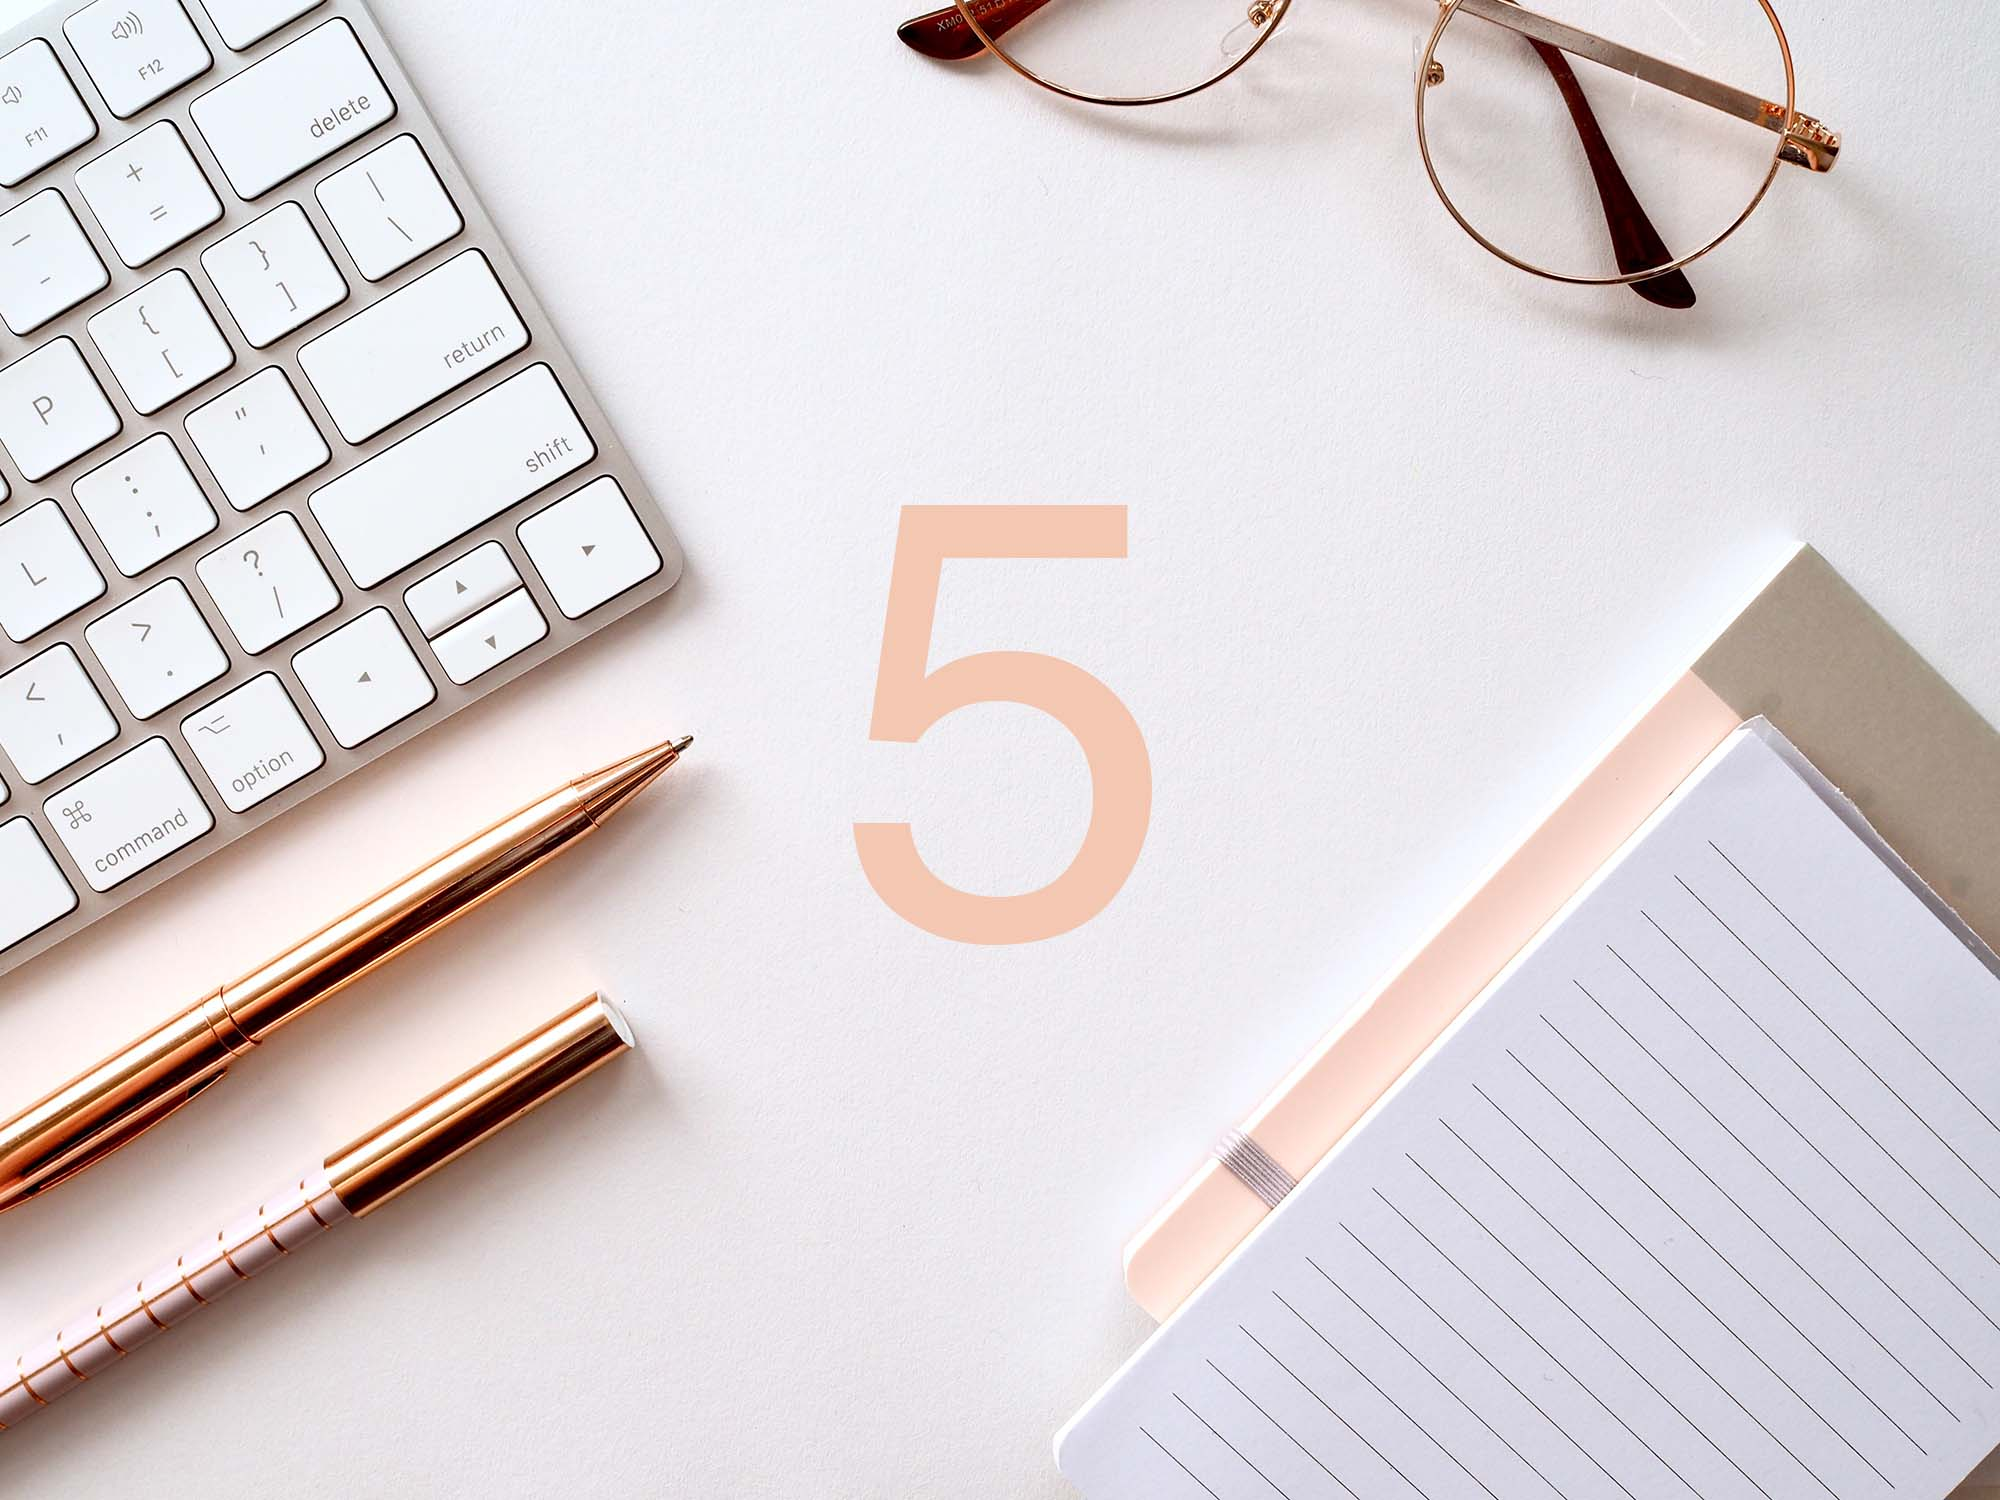 5 Reasons your Design Website Needs a Blog